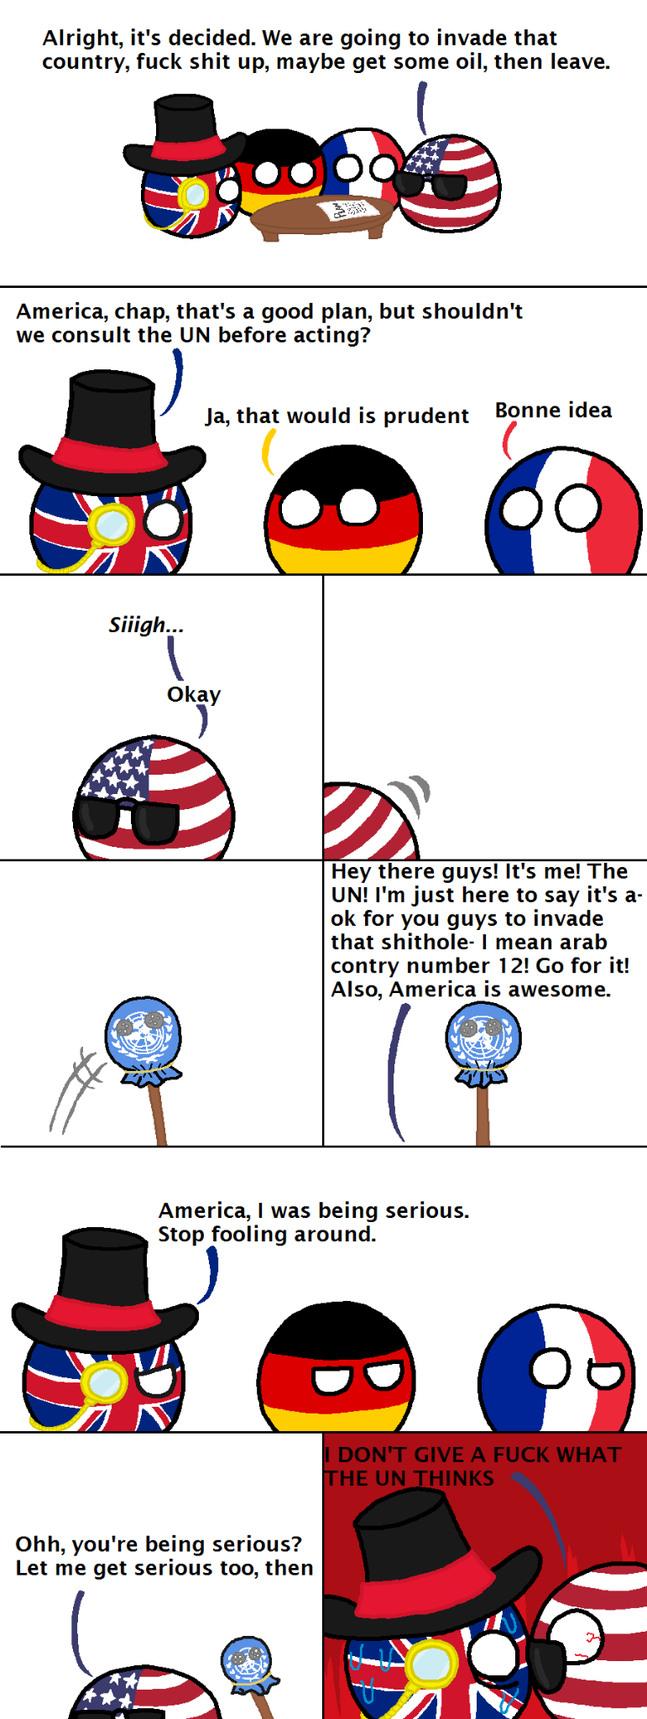 america has no phucks to give - meme